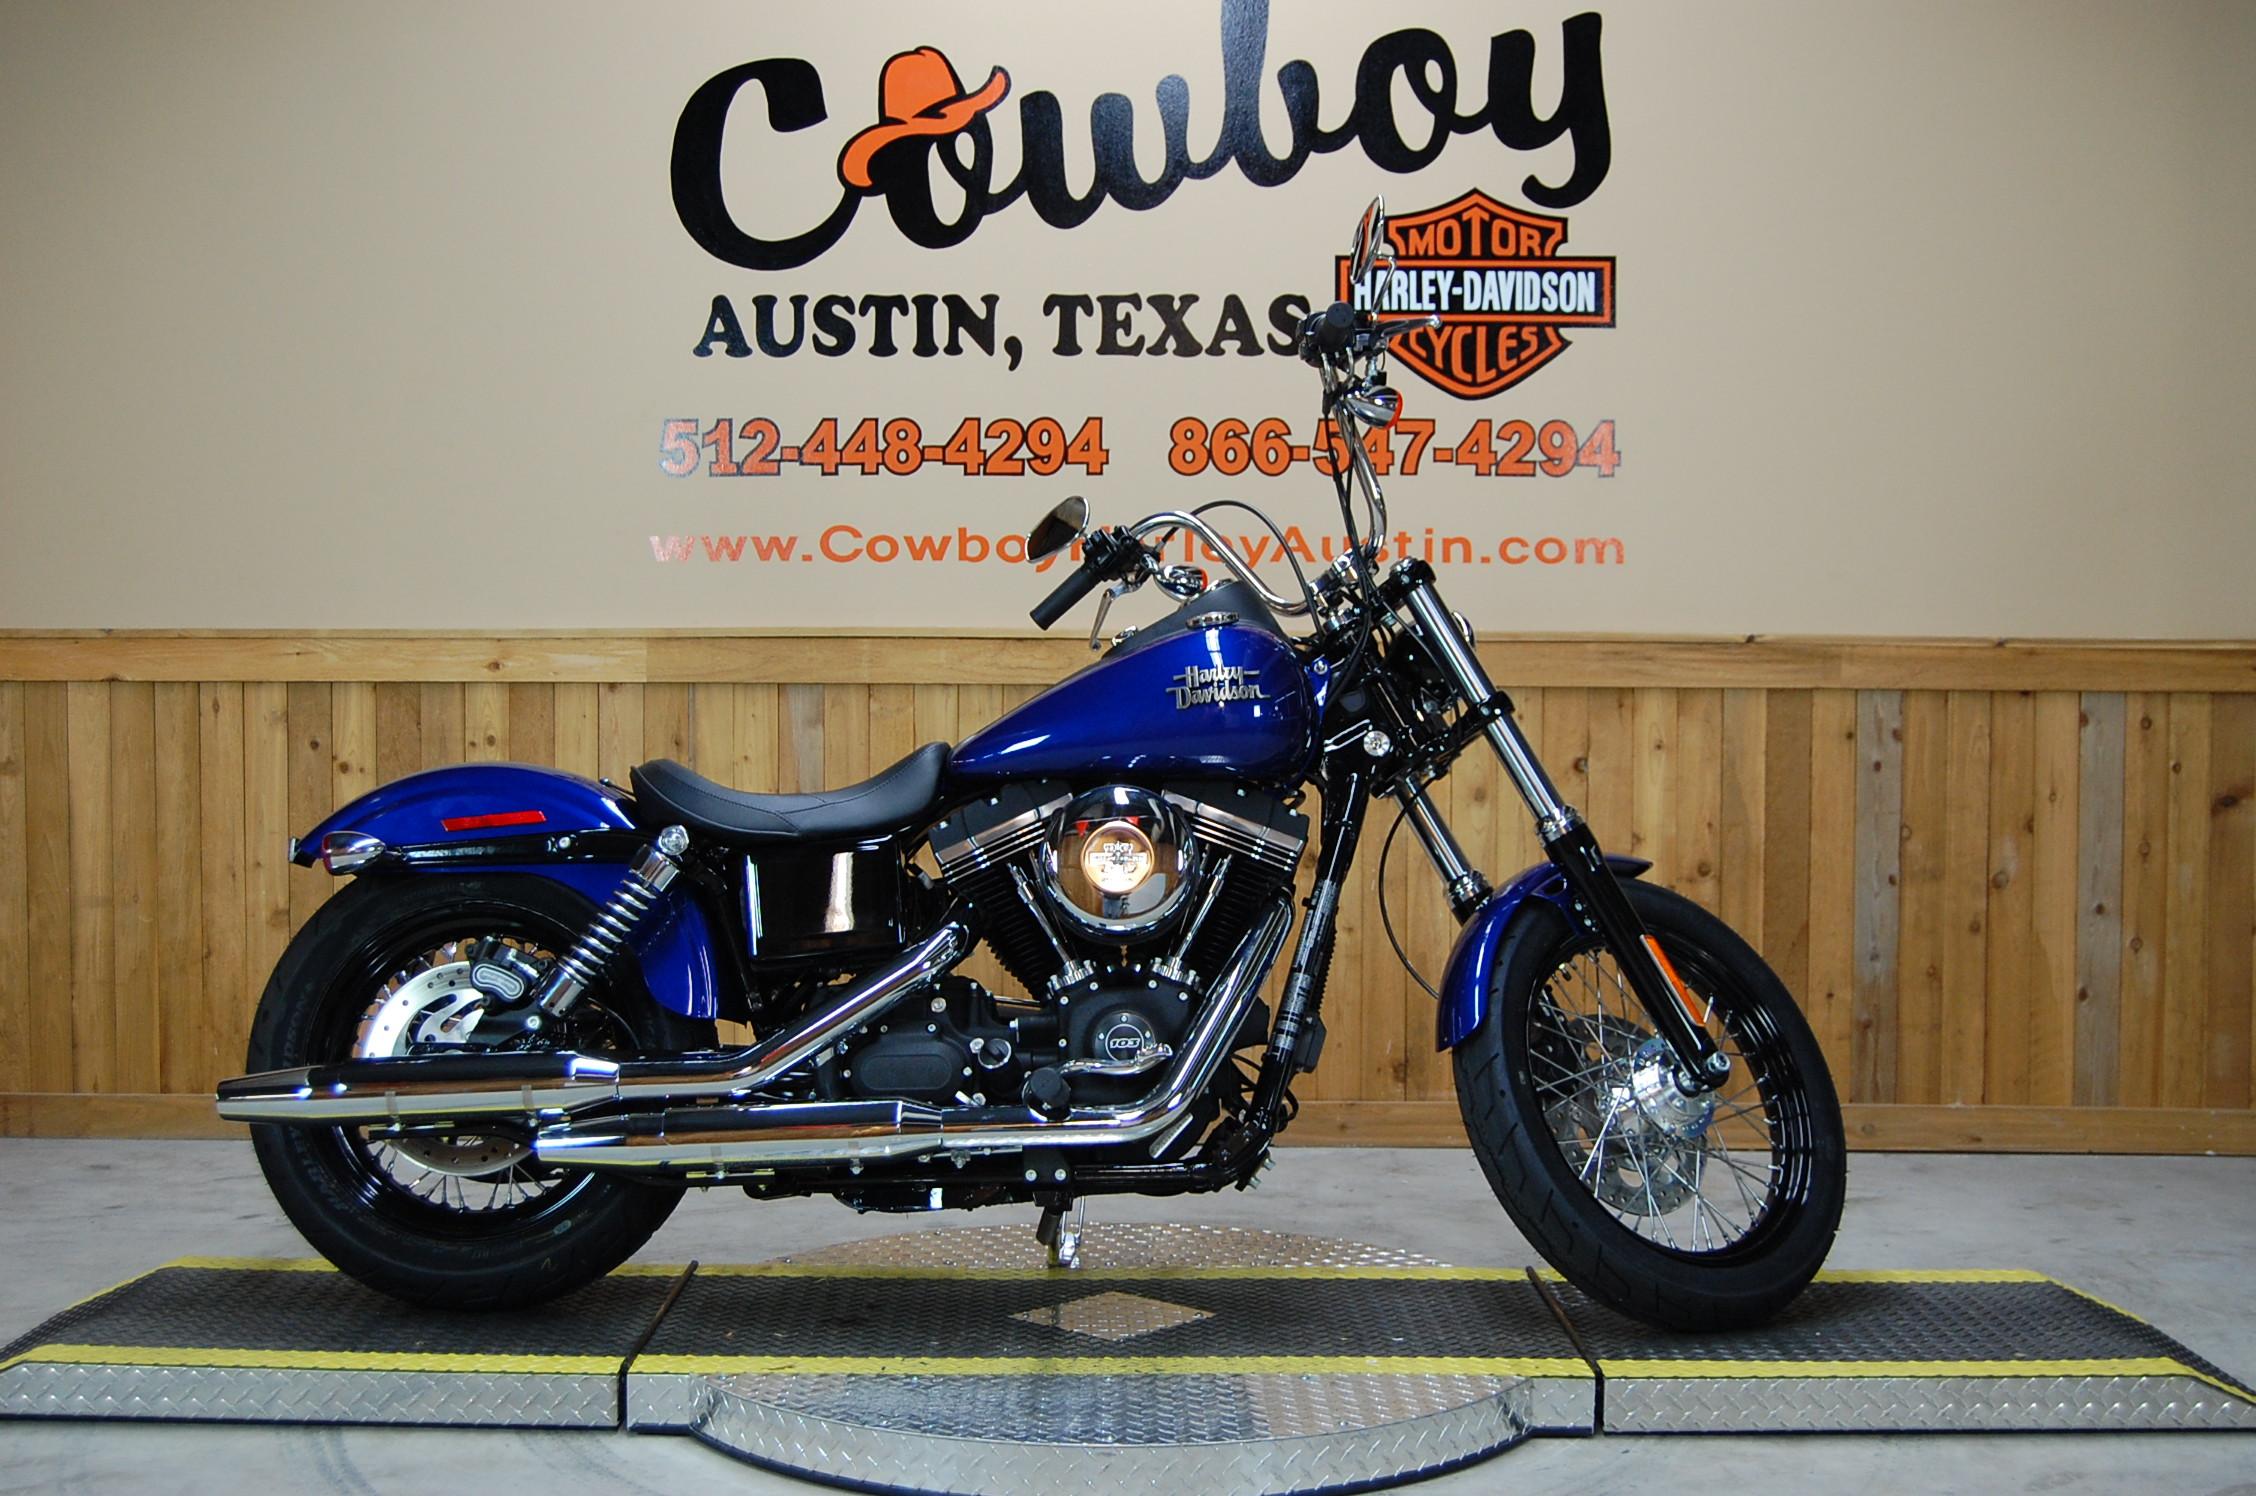 Harley Davidson FXDB Street Bob Wallpaper Background 23591 Harley 2256x1496